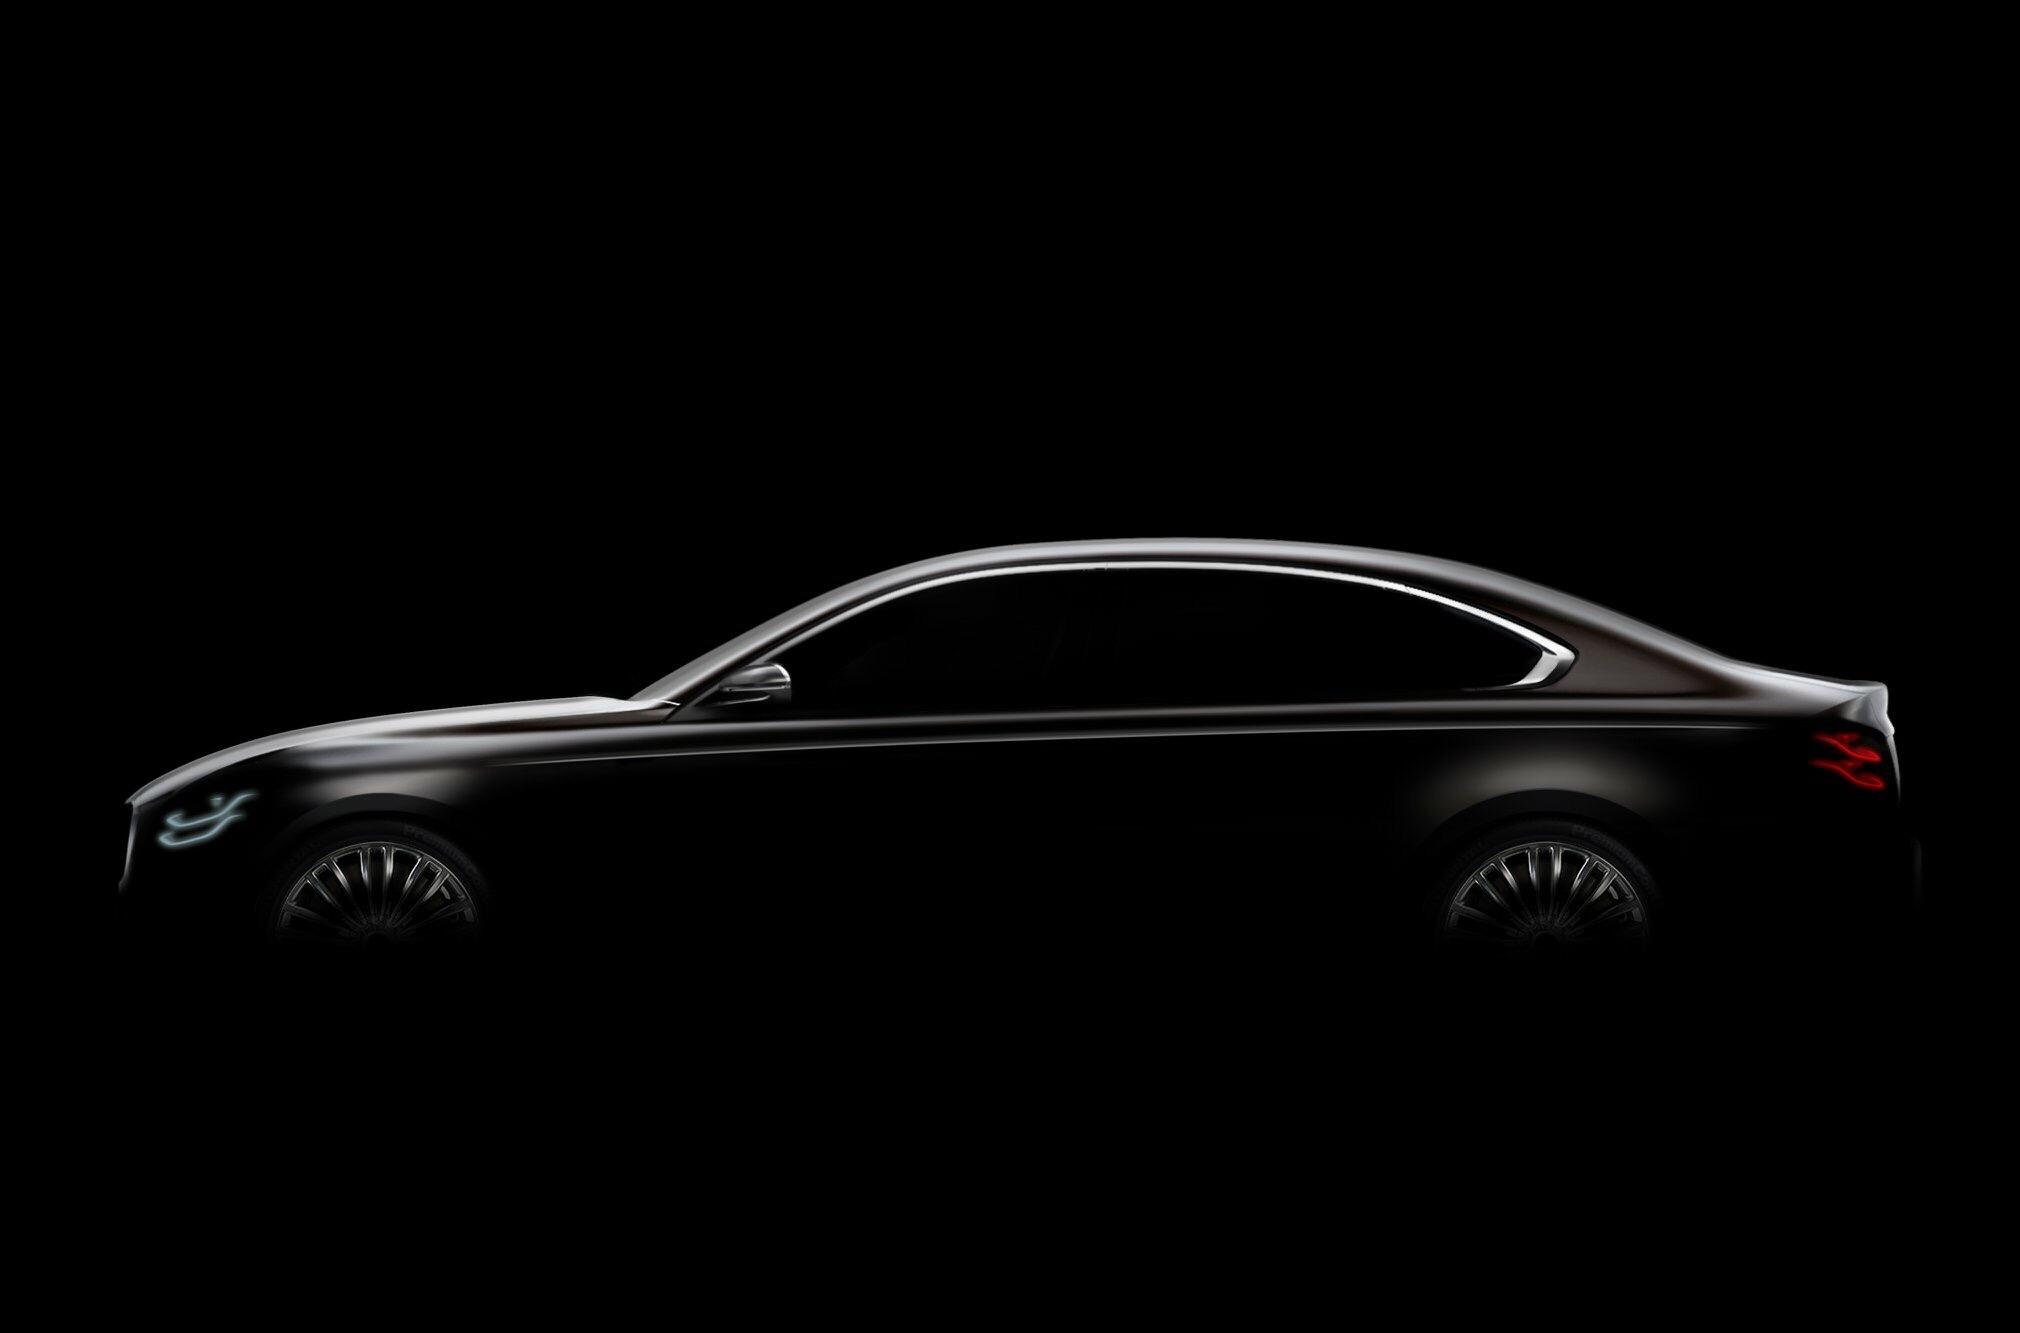 Kia Previews Second Generation K900